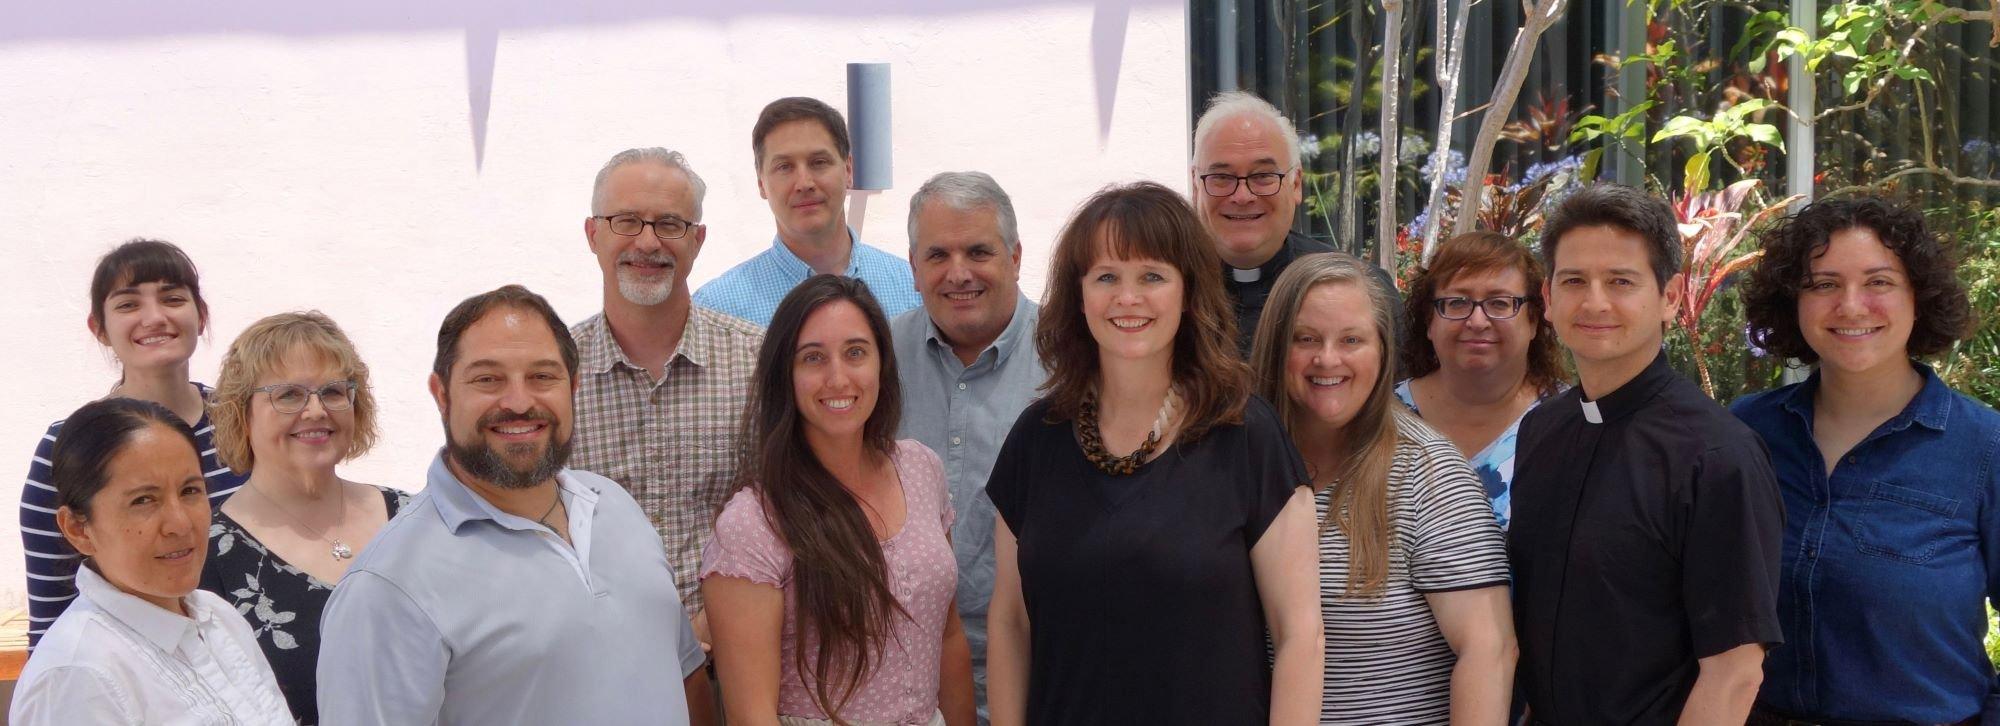 Staff Photo June 2021-cropped-resized NO KEN